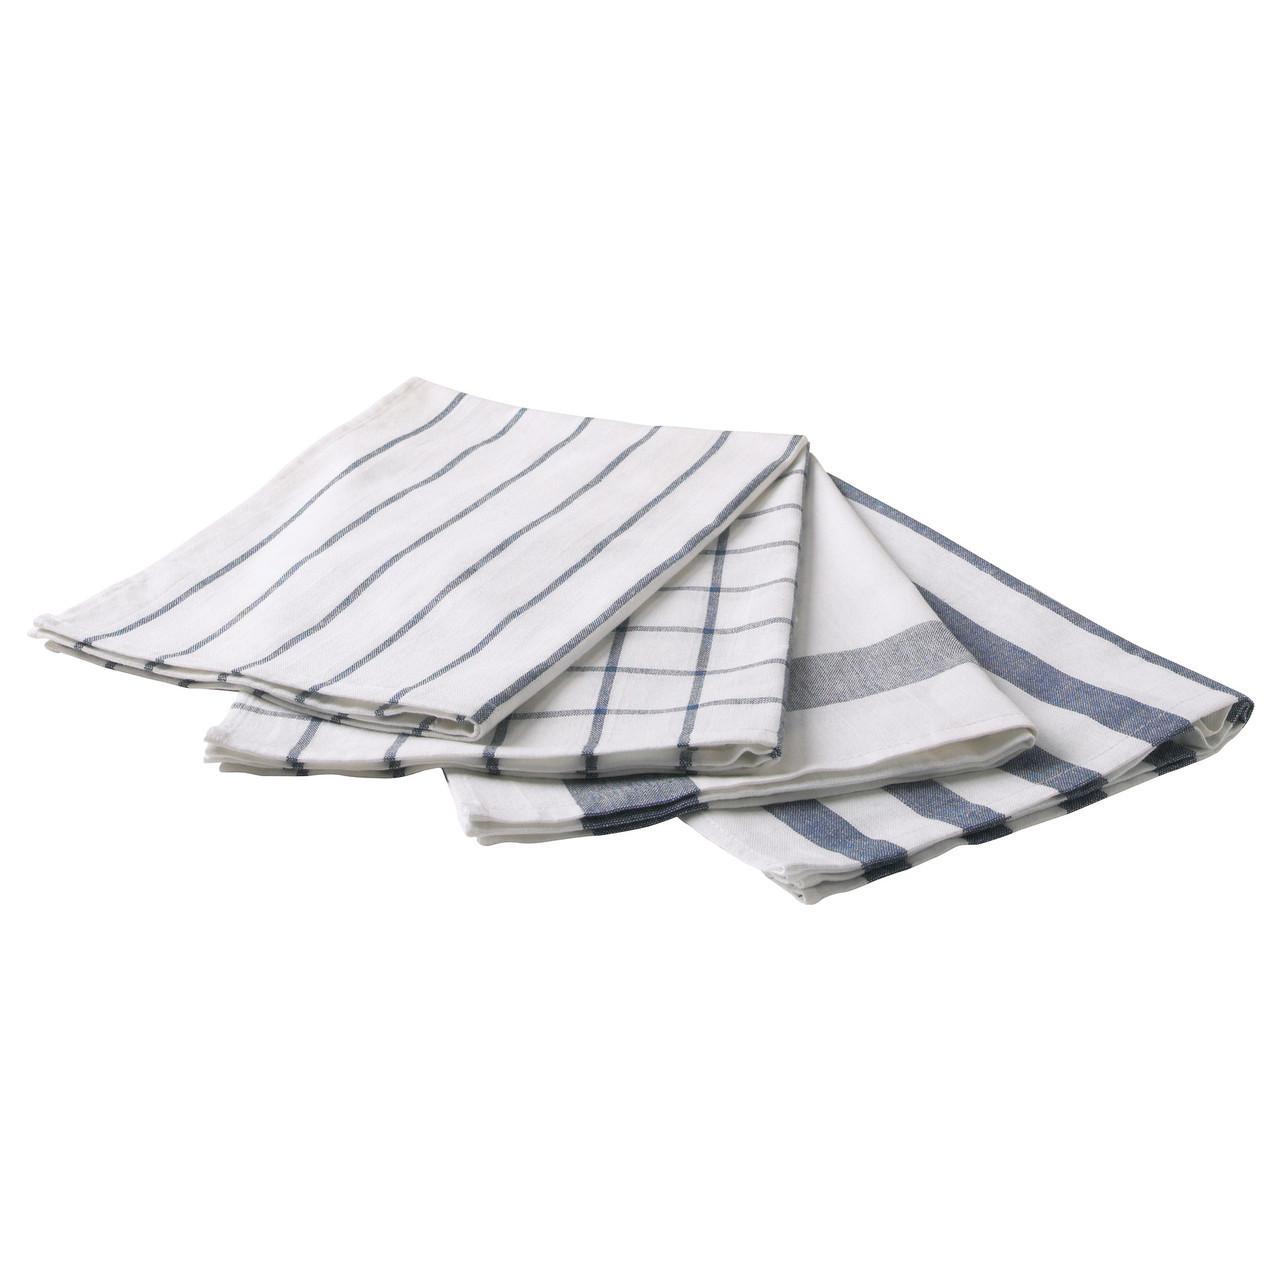 Полотенце кухонное икеа ELEE, белый, синий, IKEA, 700.696.37